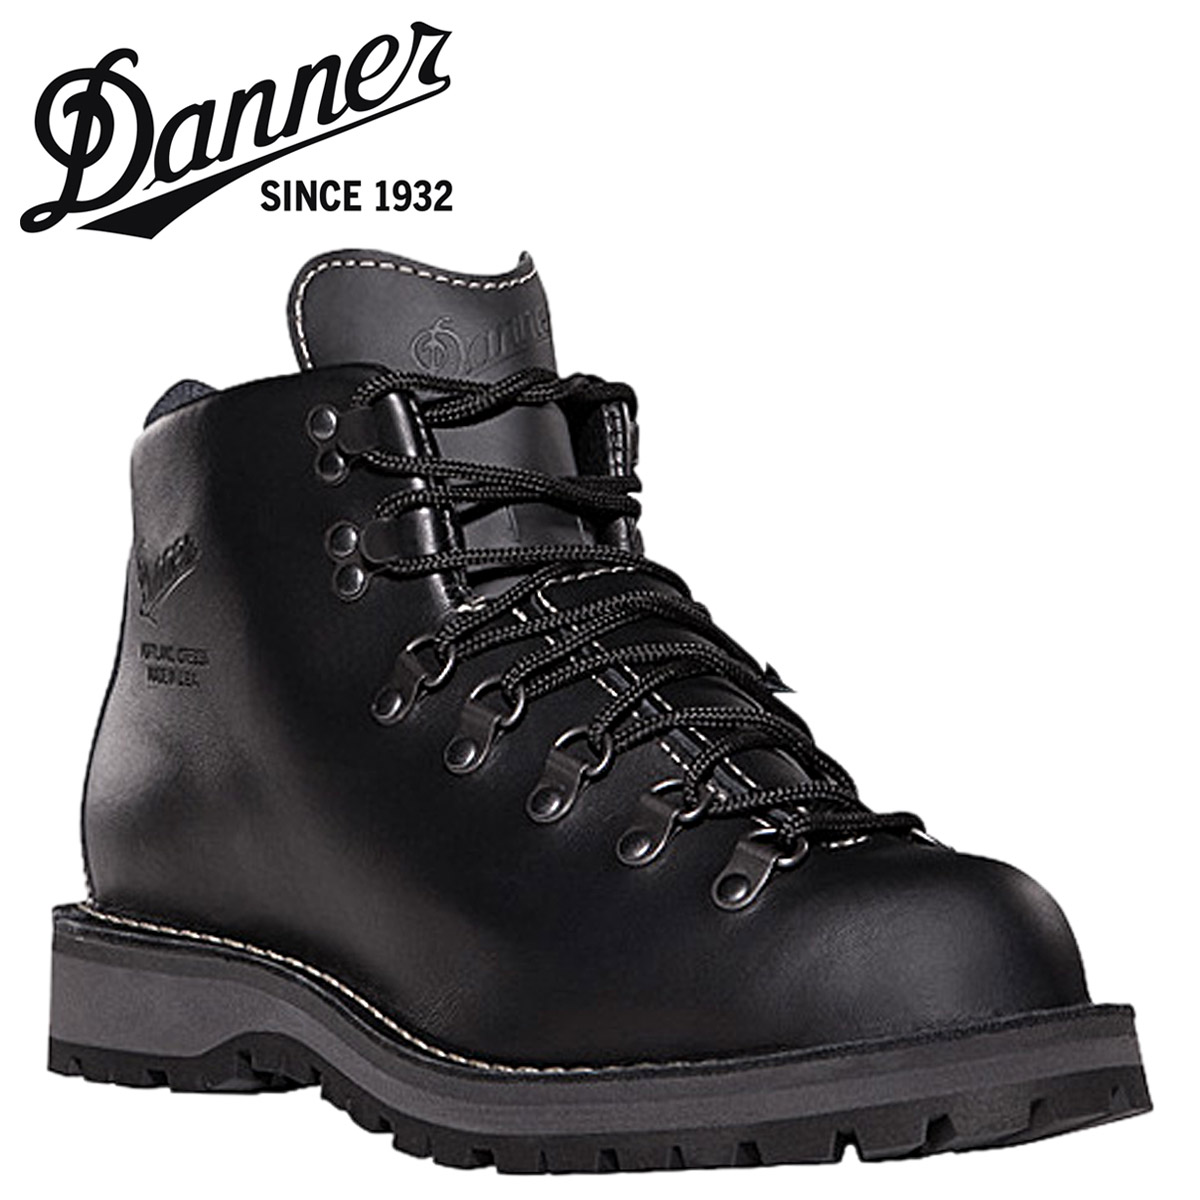 Danner ダナー マウンテンライト2 30860 ブラック 黒 Mountain Light II Dワイズ EEワイズ レザー GORE-TEX Made in USA メンズ